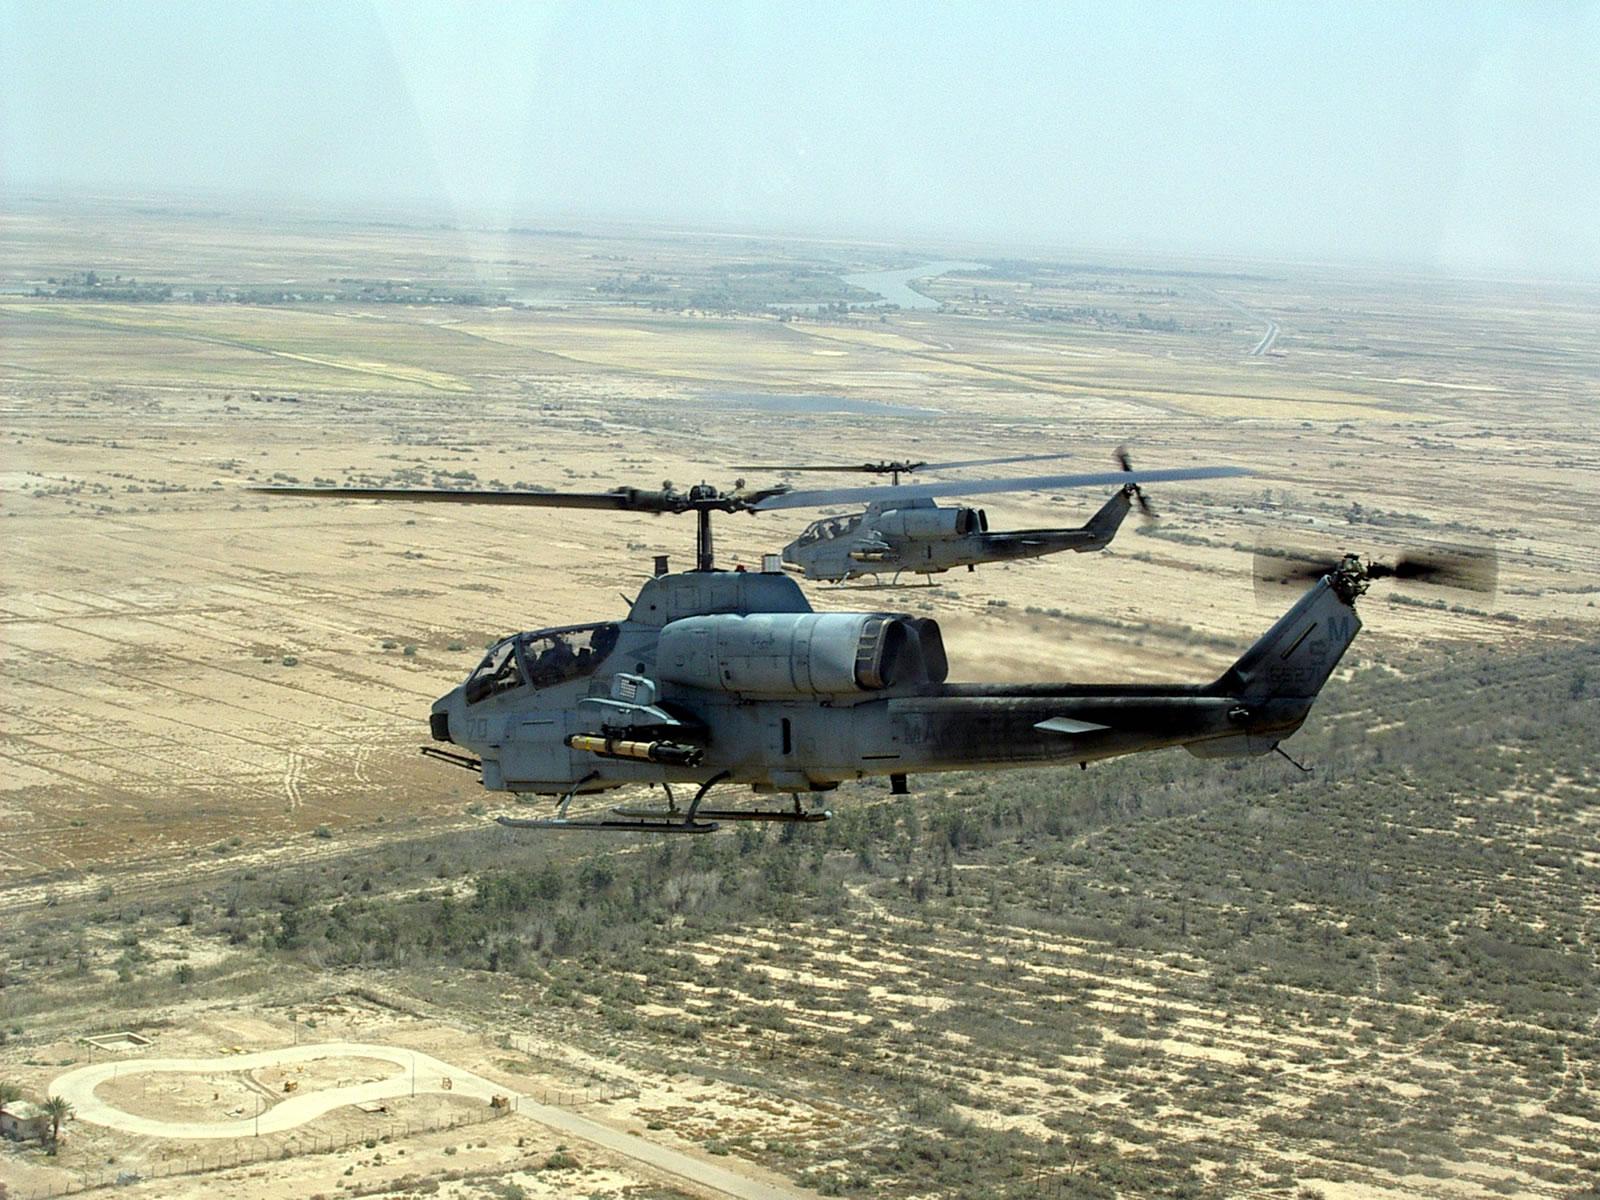 http://2.bp.blogspot.com/_skY9JIXu1ts/S8G4N0Gvl8I/AAAAAAAAAEI/dSbMWx81ovQ/s1600/cobra-helicopter_1.jpg